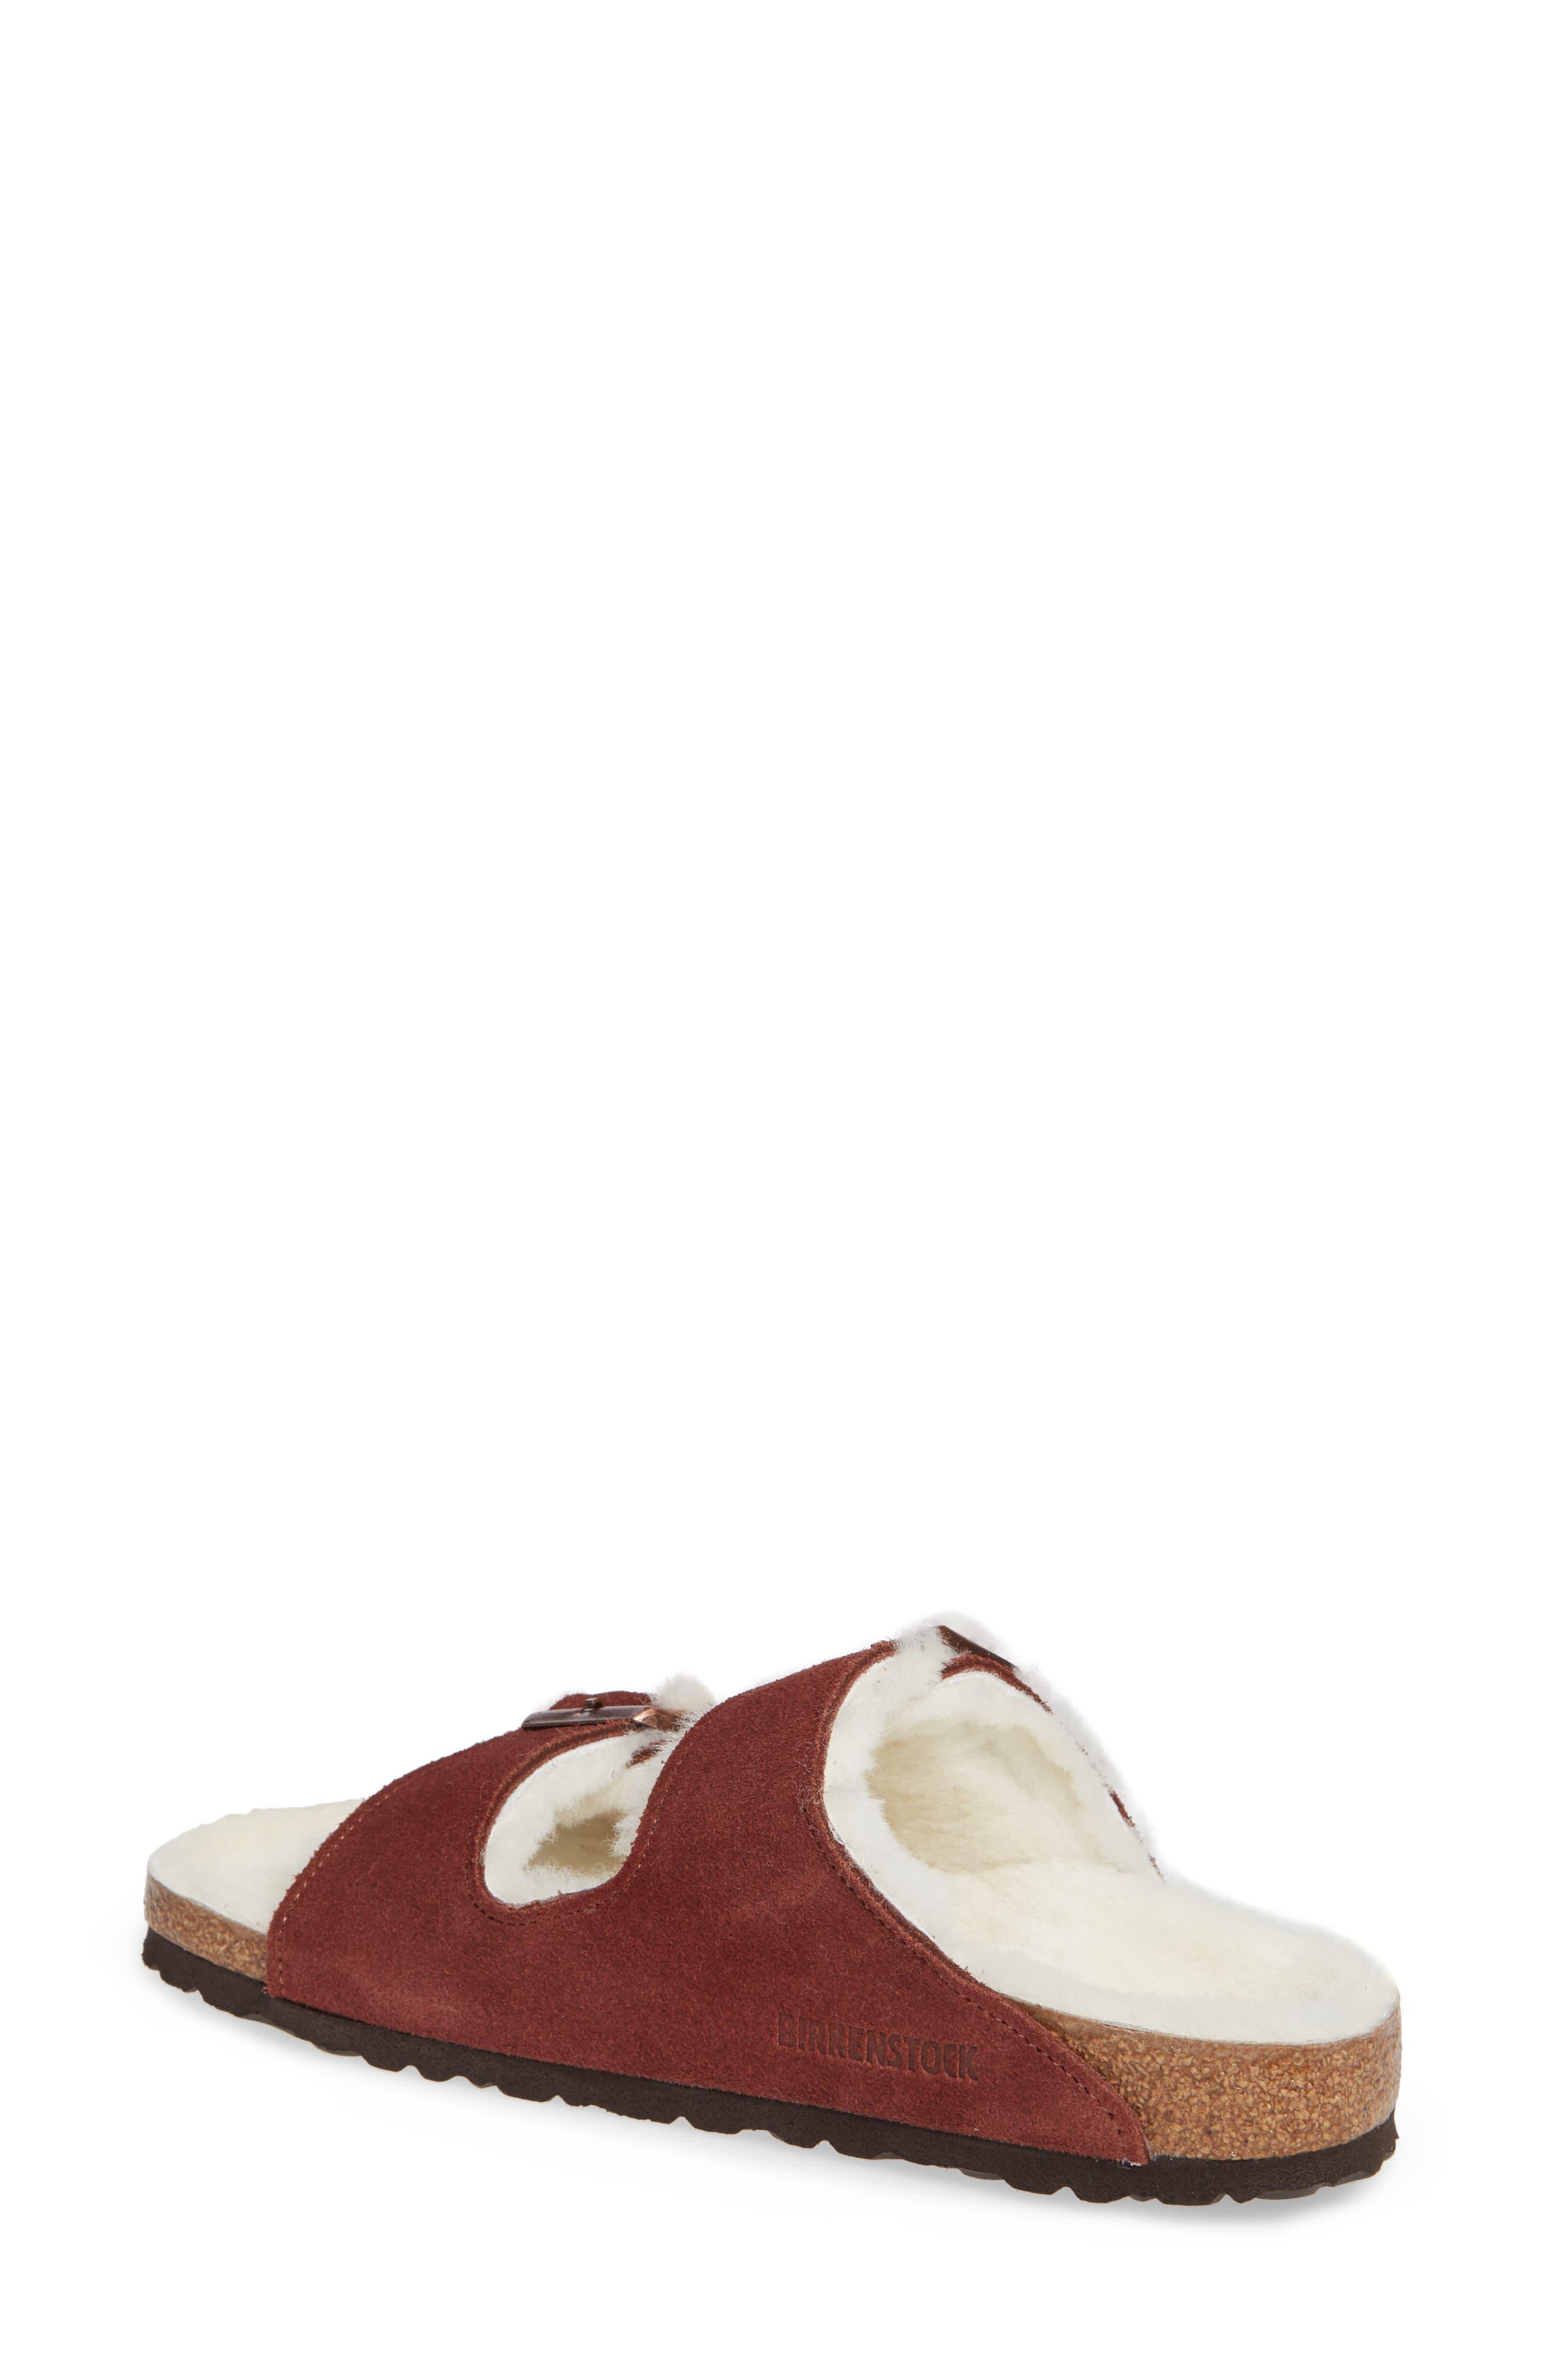 'Arizona' Genuine Shearling Lined Sandal,                             Alternate thumbnail 2, color,                             PORT SUEDE